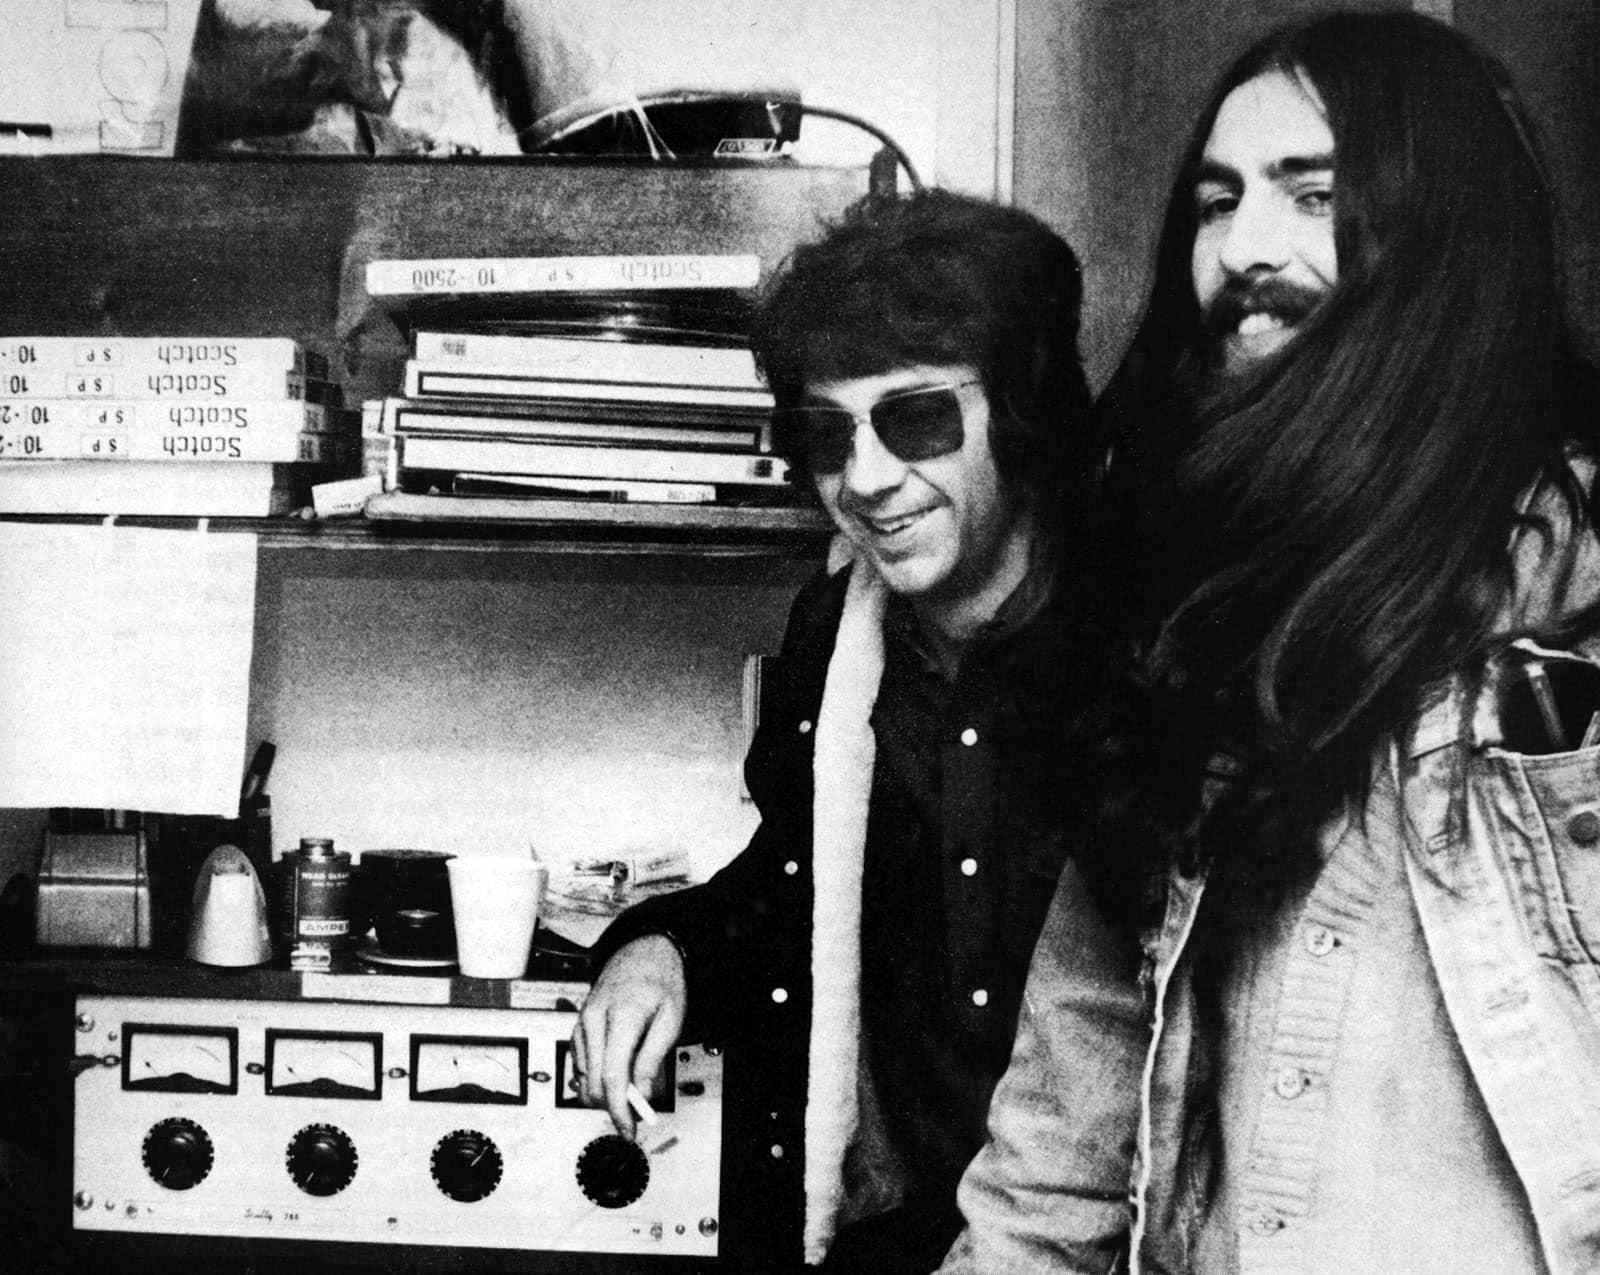 Morre, aos 81 anos, Phil Spector, polêmico produtor dos Beatles